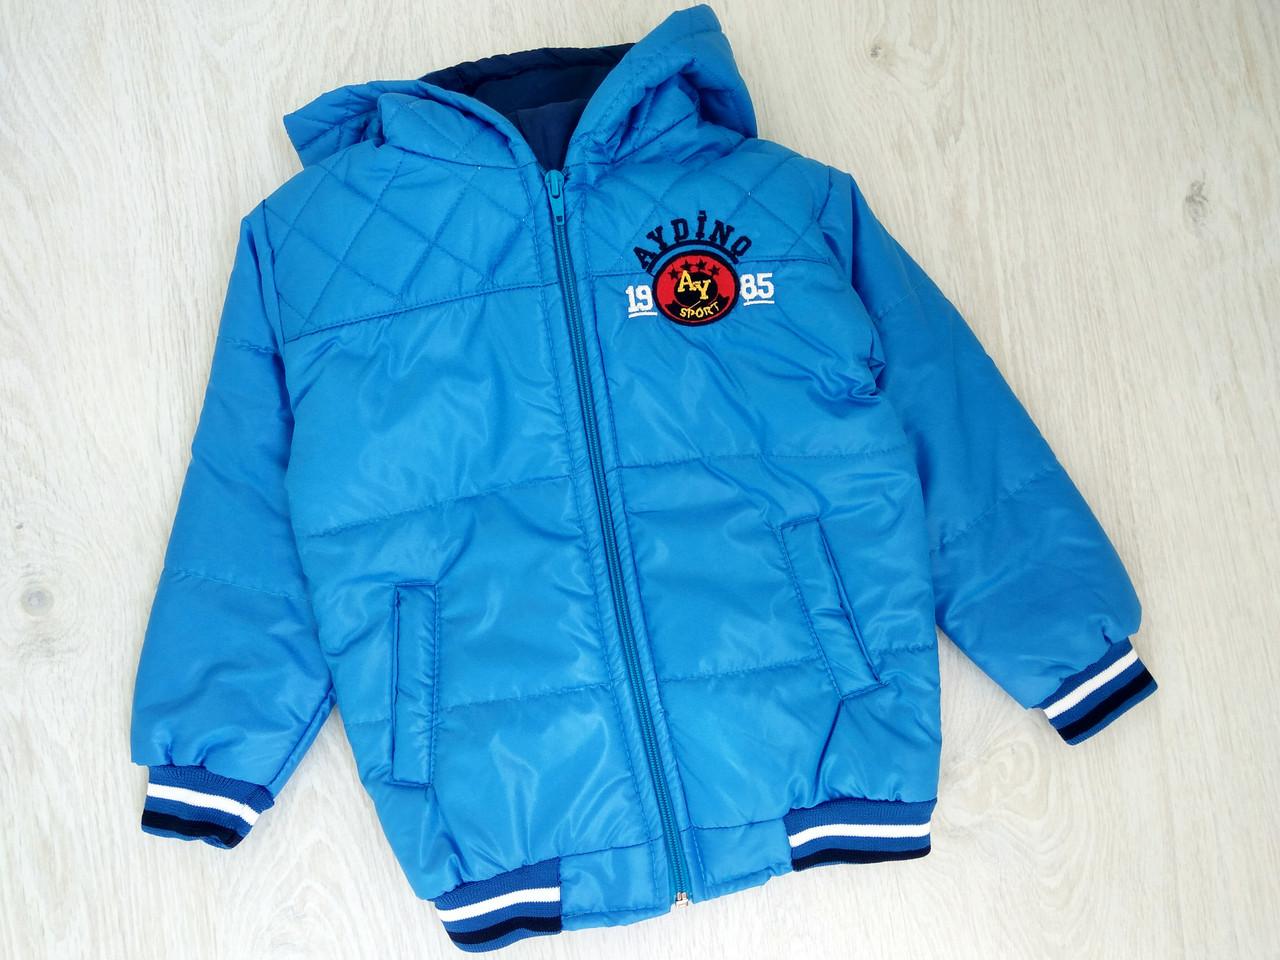 Куртка  для мальчика, Турция, Babexi,арт. 361-2, рр 2-3 года,